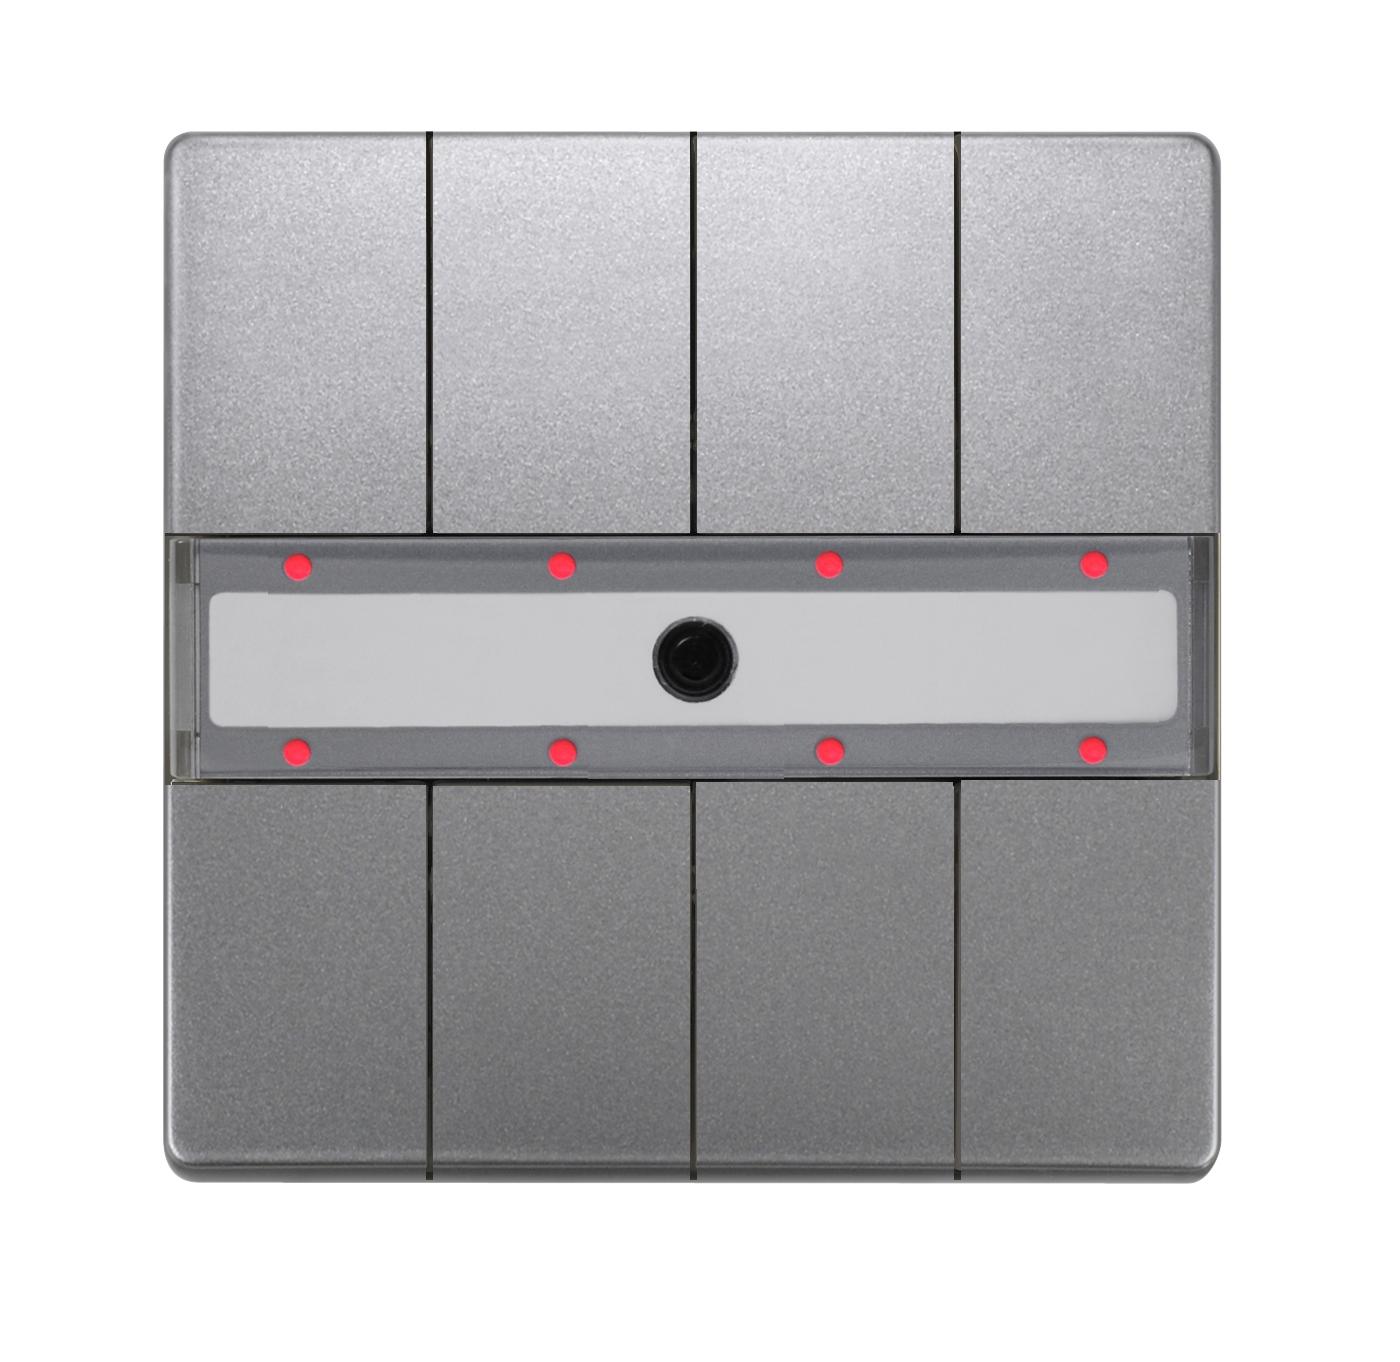 1 Stk Taster 4-fach mit Status-LED, DELTA style, platinmetallic KX2872DB45